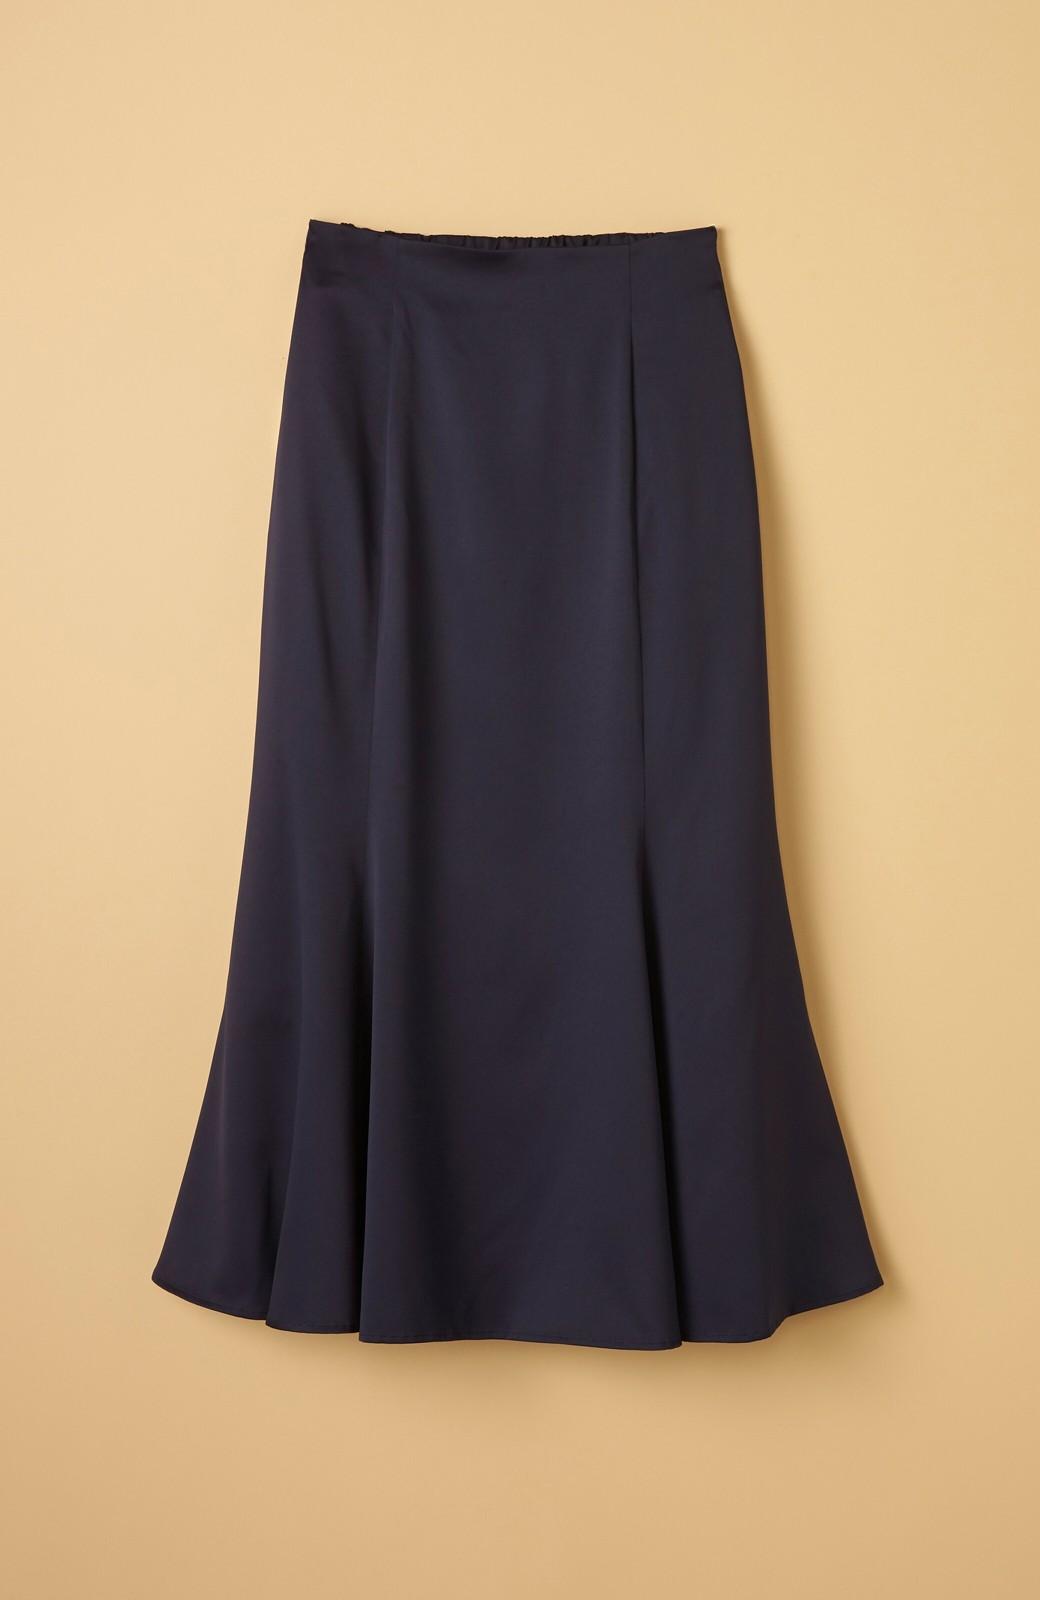 haco! スウェットやスニーカーを合わせても女っぽくいられるサテンマーメイドスカート by que made me <ネイビー>の商品写真15